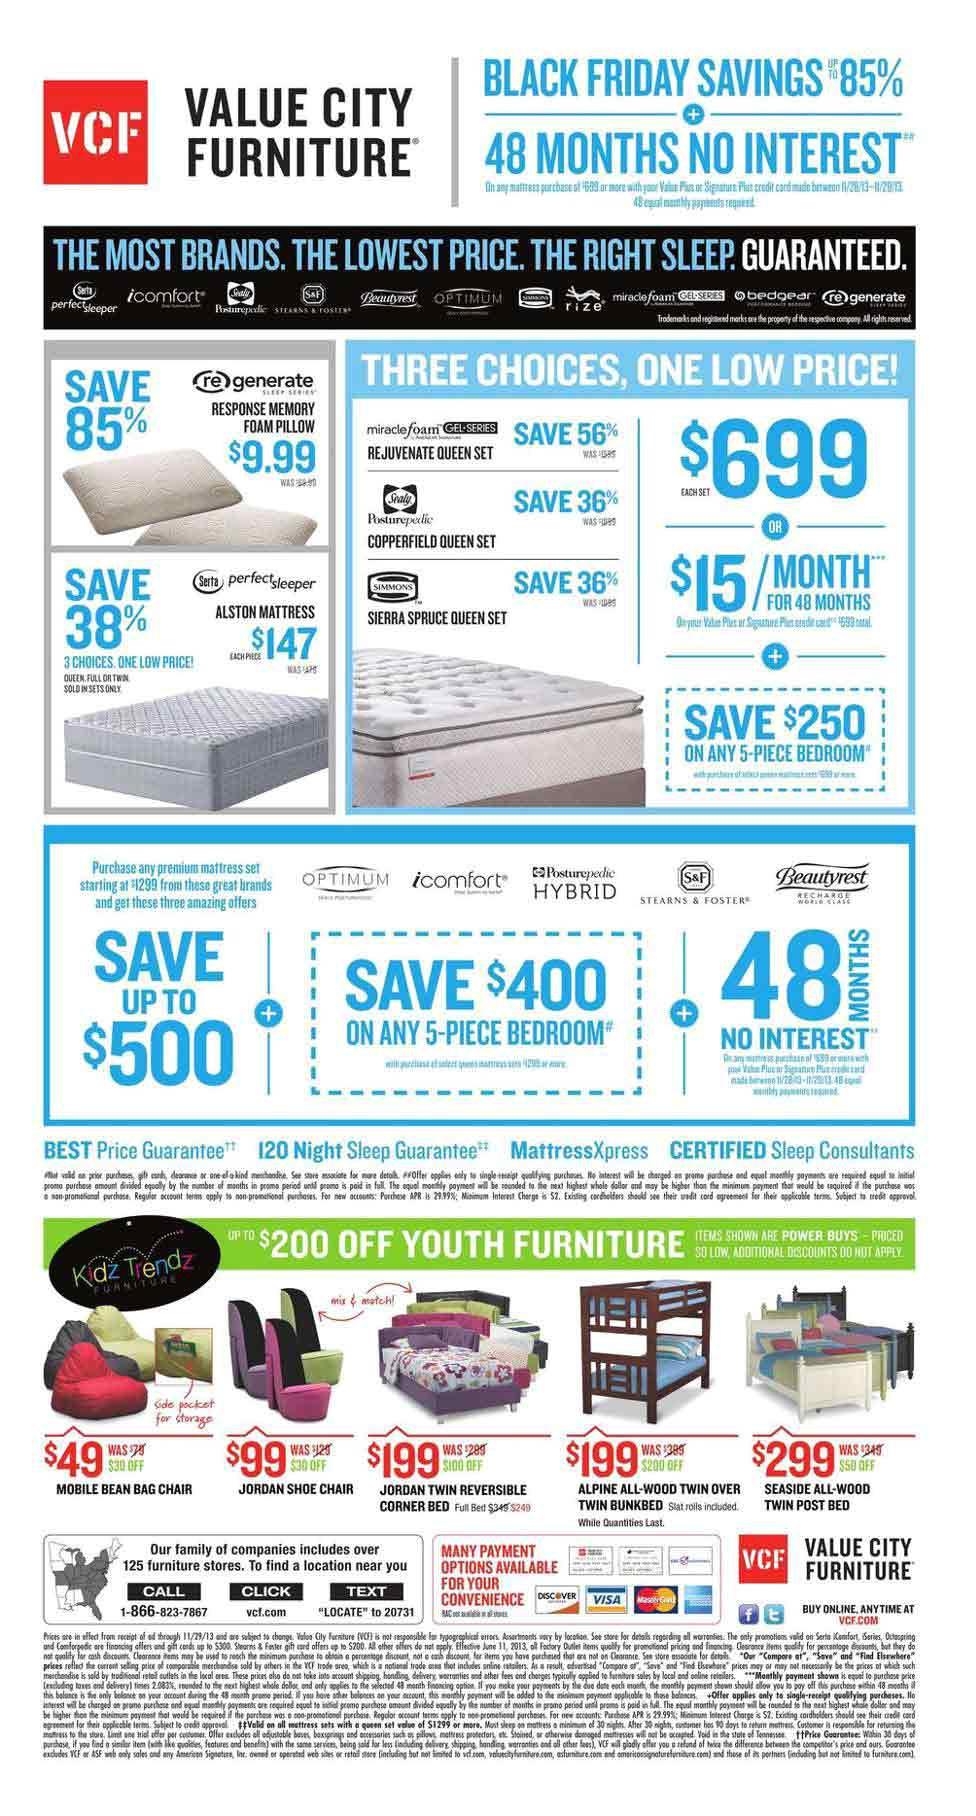 value city black friday 2013 ad find the best value city black friday deals and sales nerdwallet